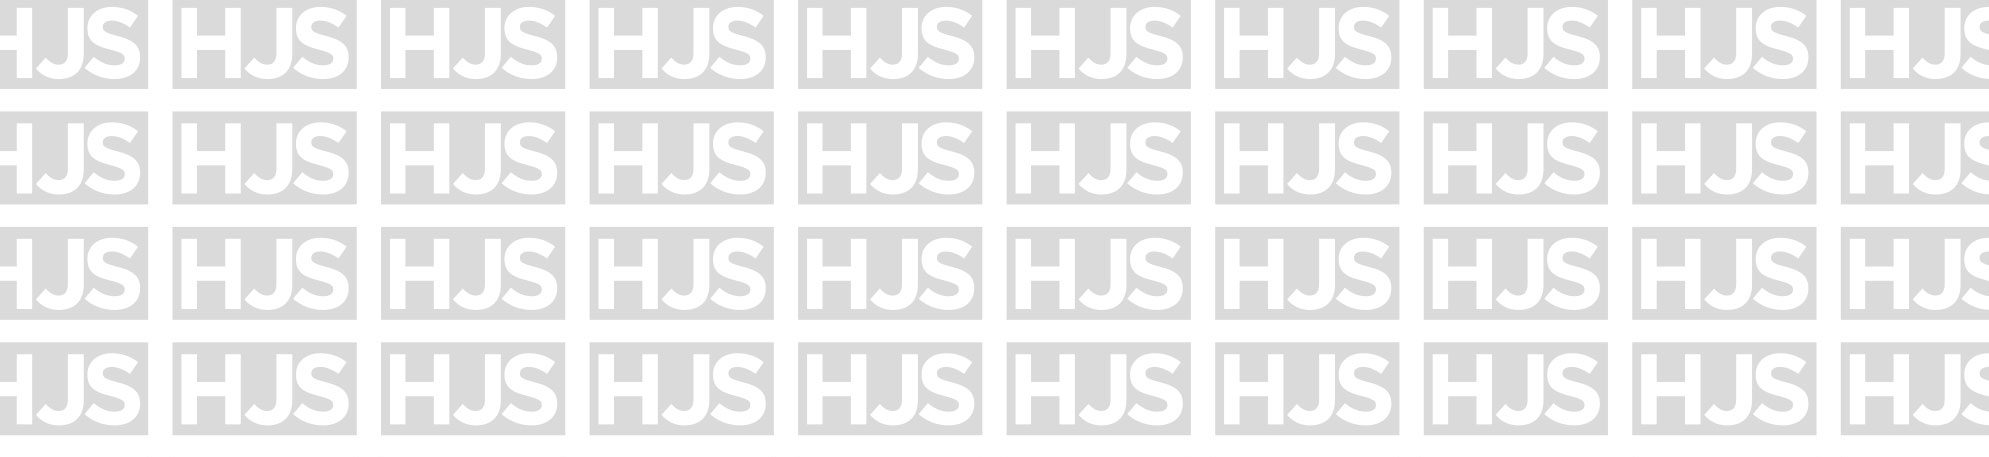 HJS-event-banner-generic-image